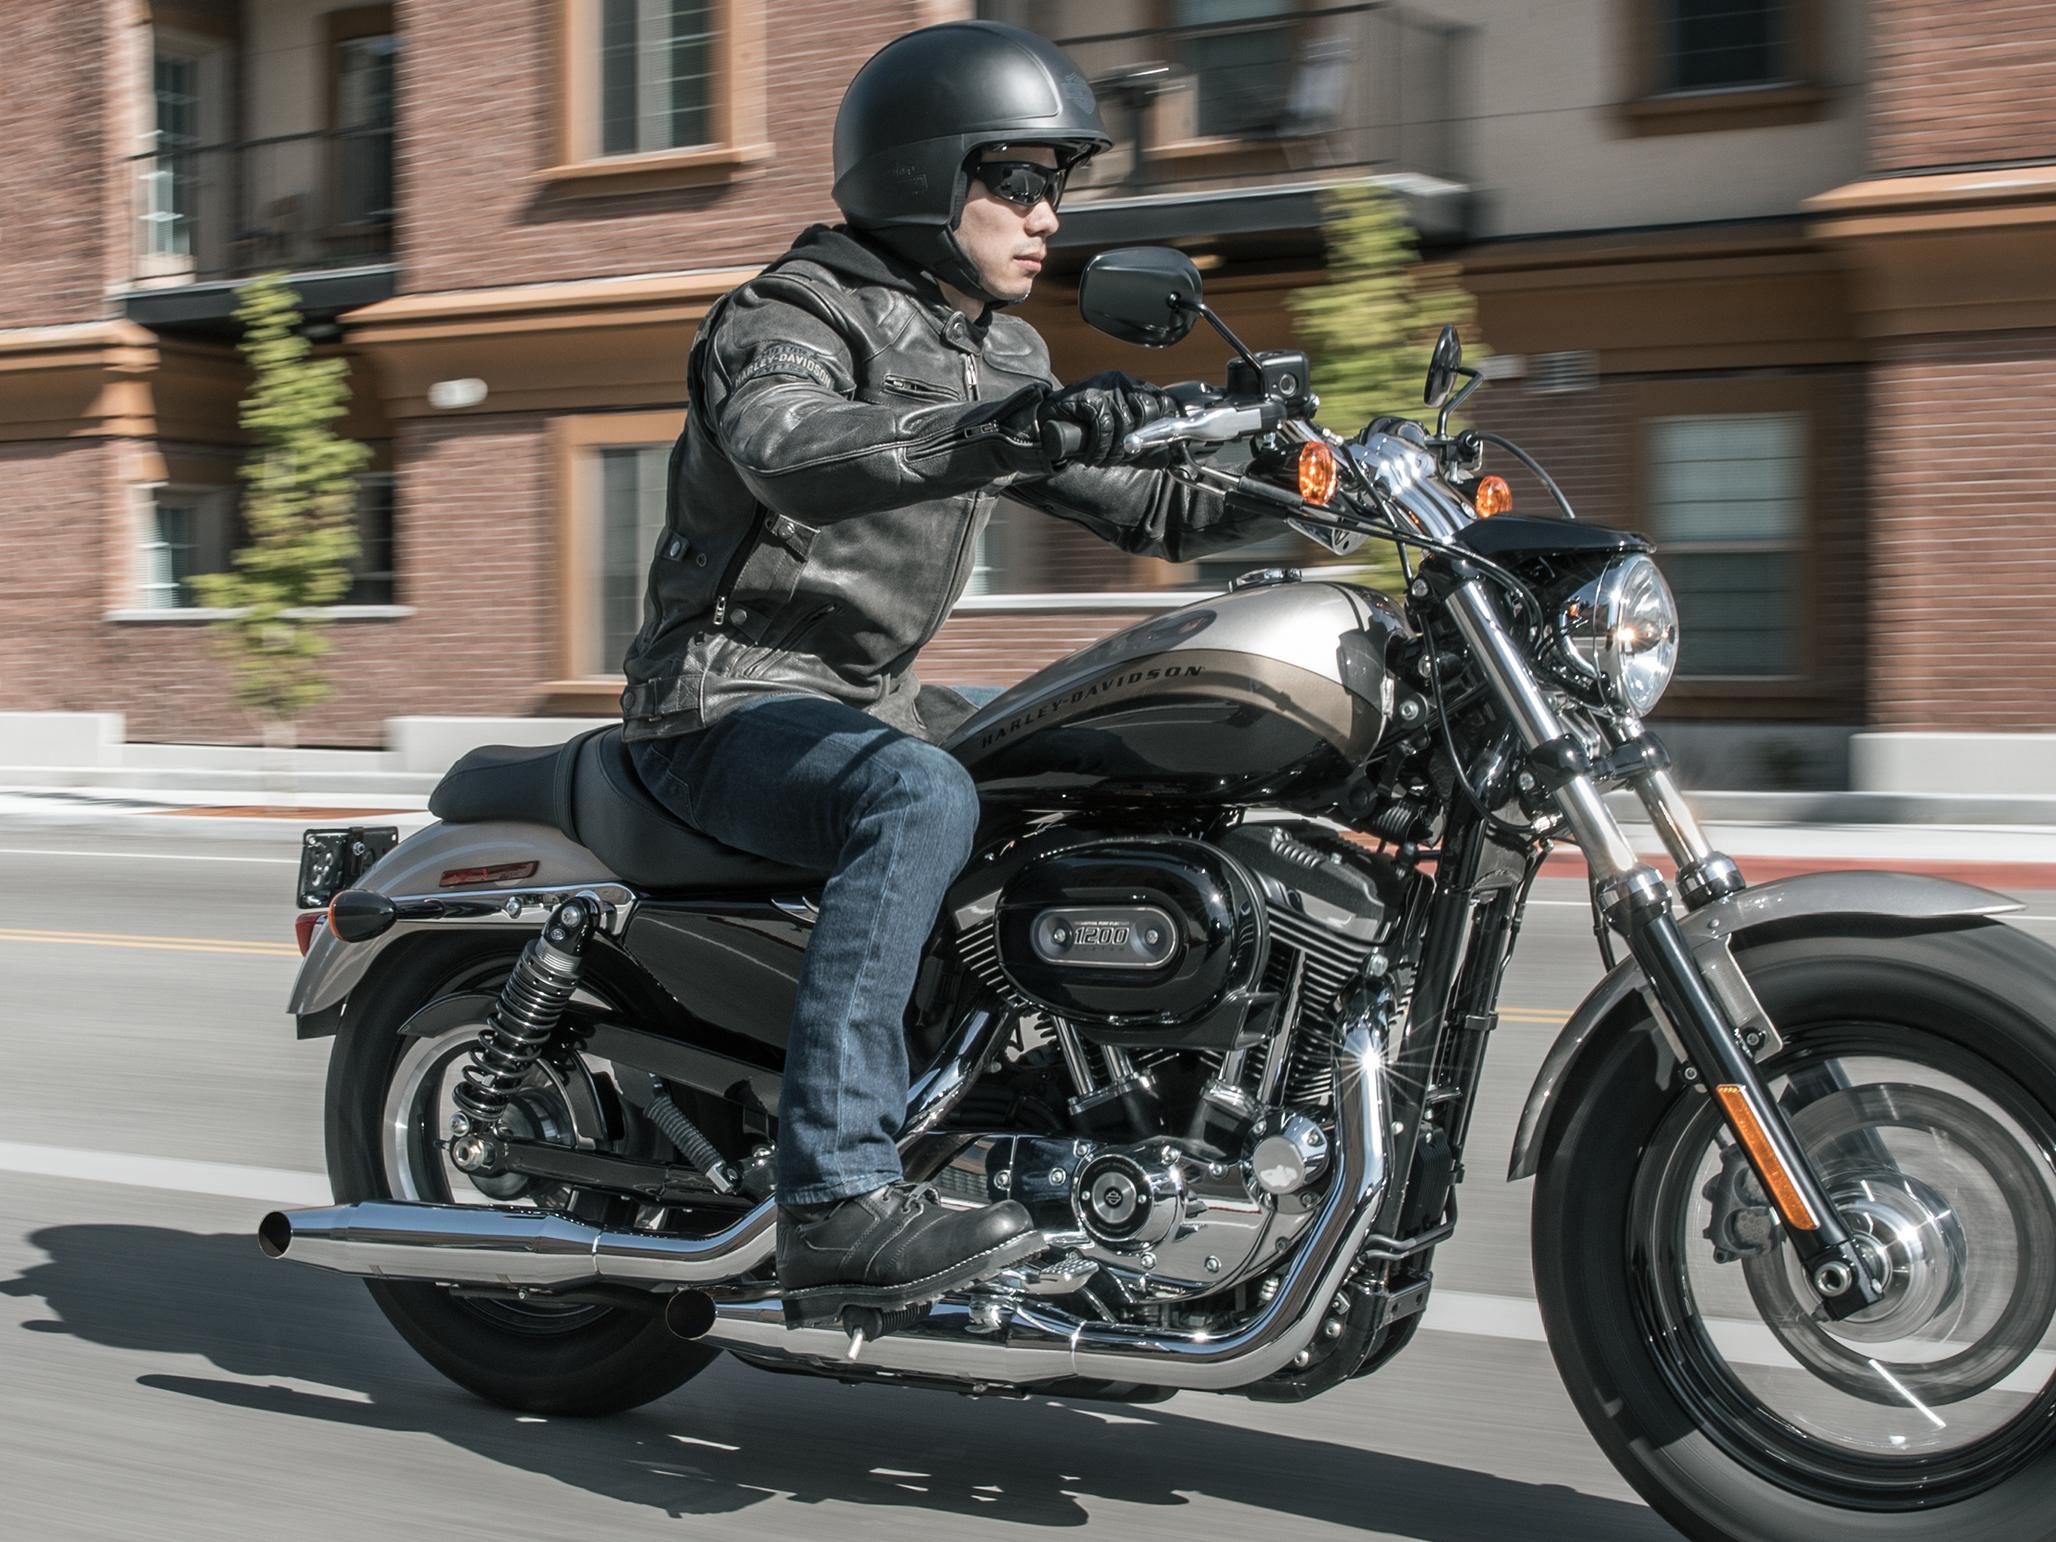 2018 Sportster 1200 Custom | Harley-Davidson USA